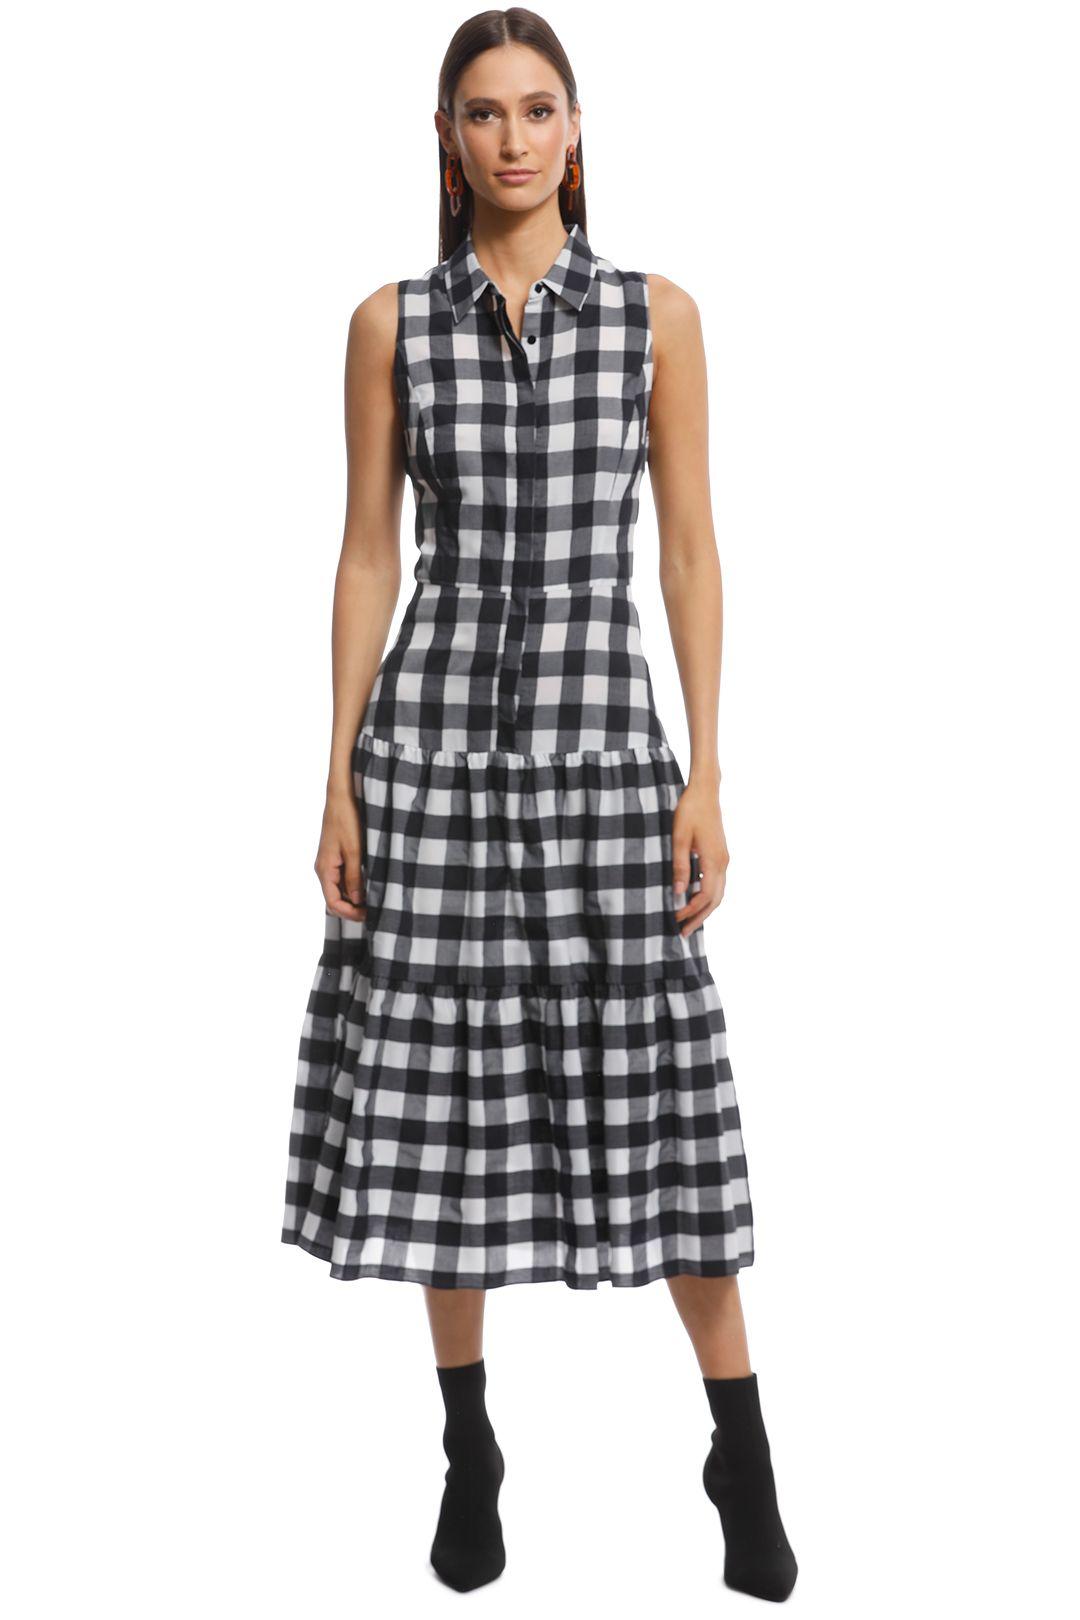 Veronika Maine - Gingham Check Midi Dress - Black White - Front